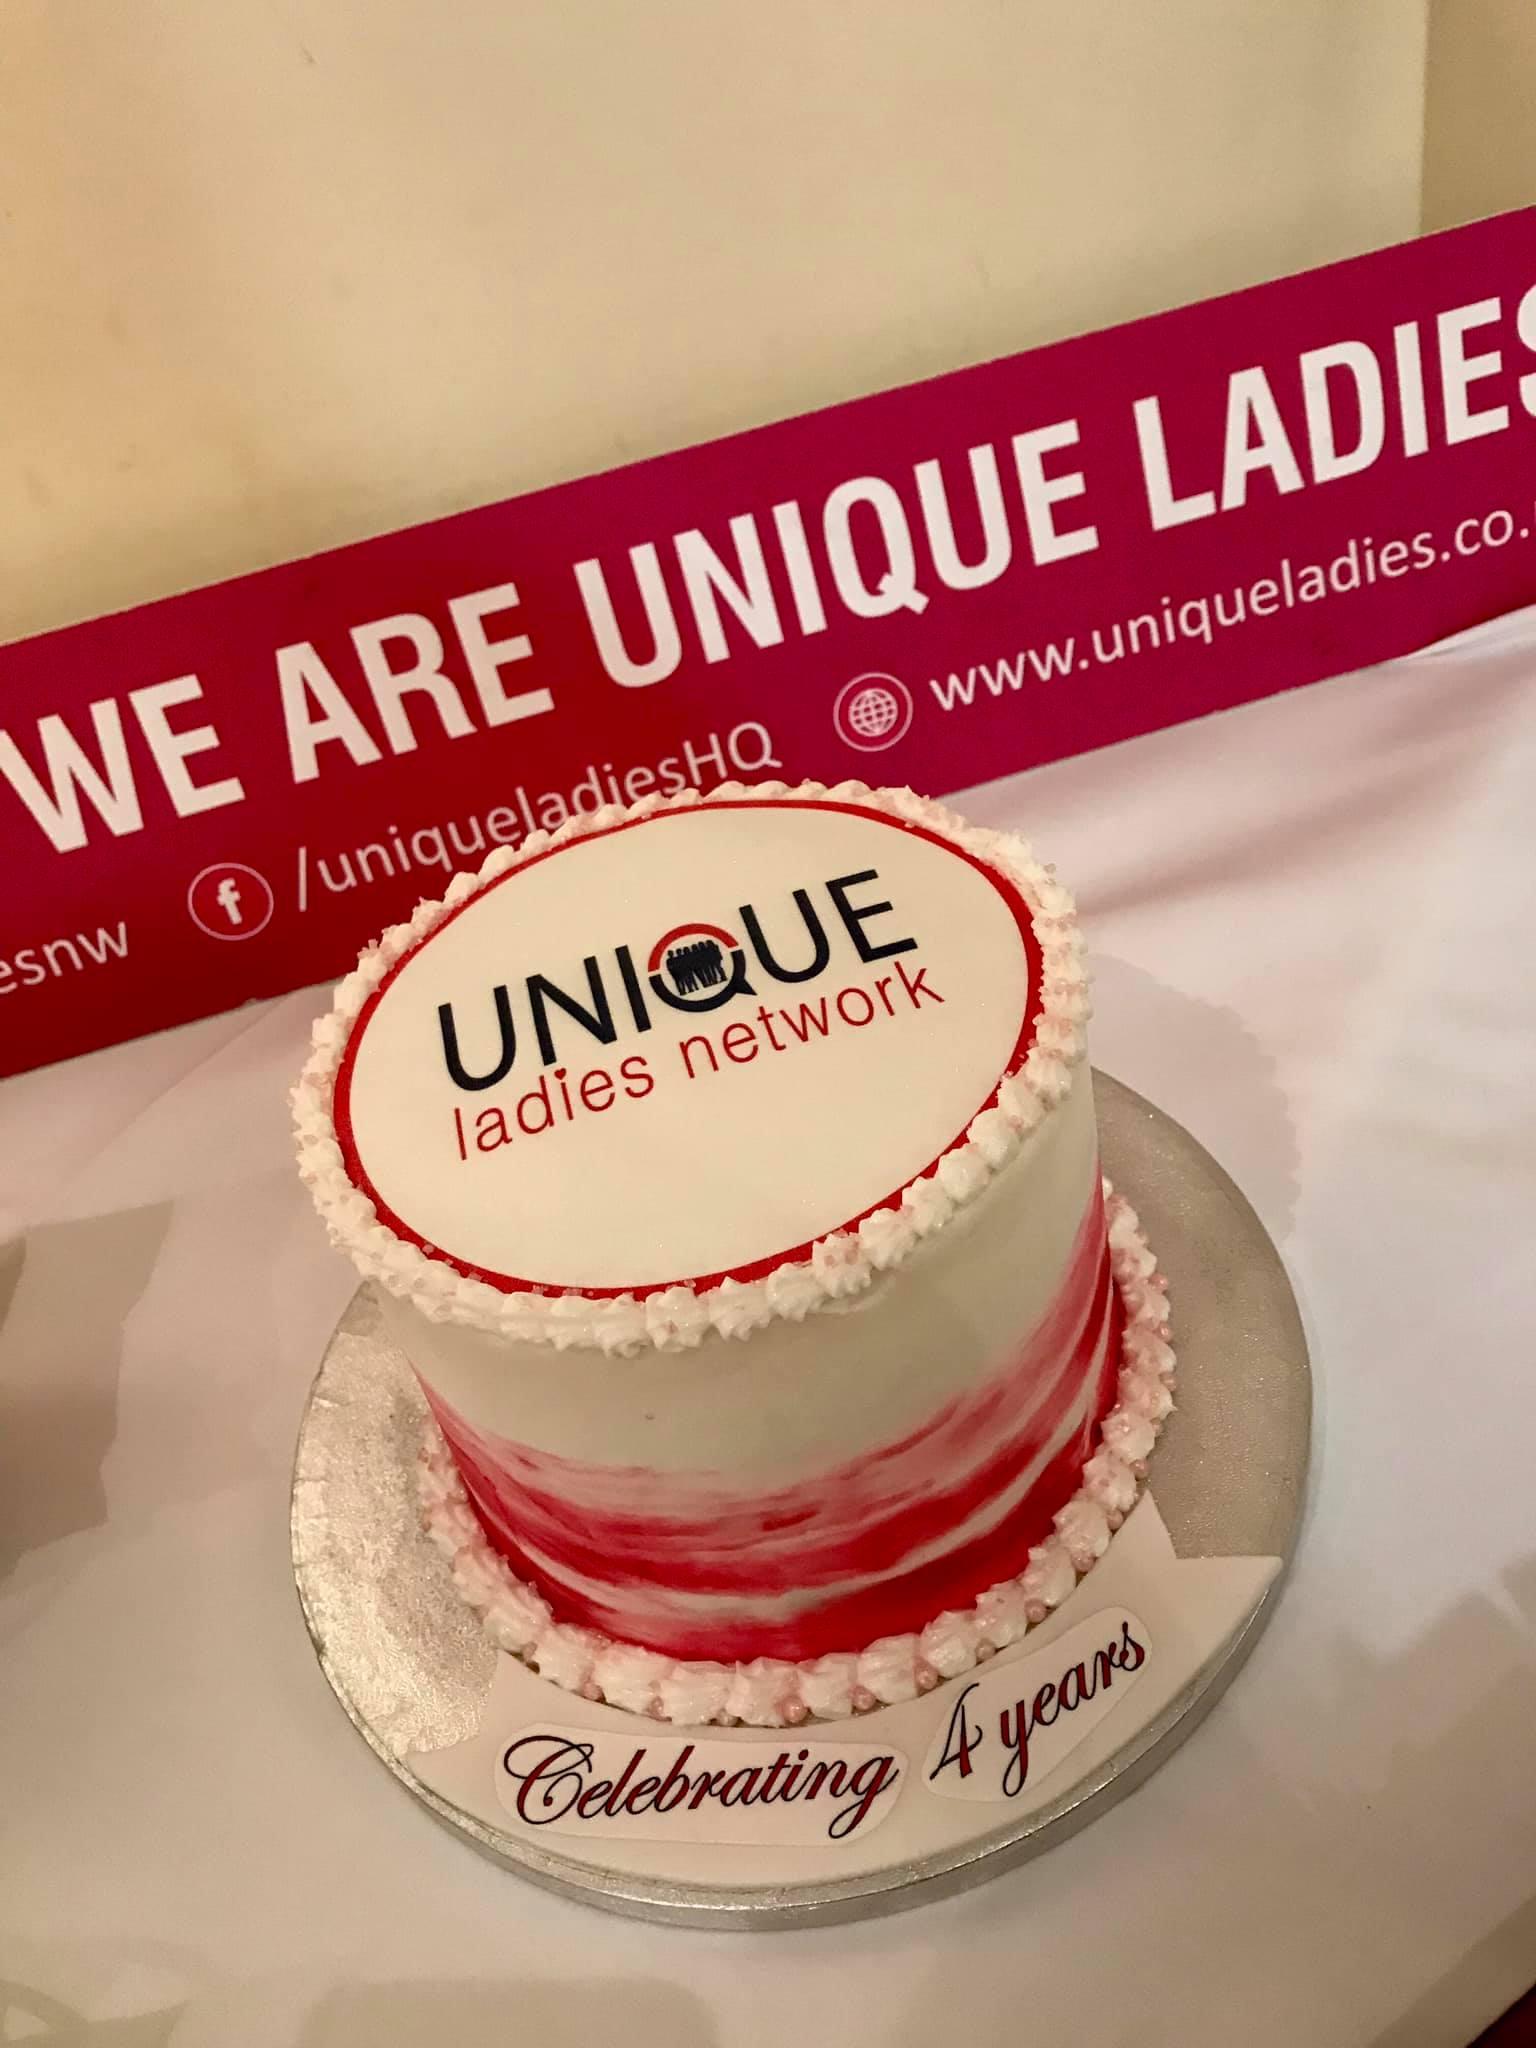 Unique Ladies Bolton Celebrating Our 4th Birthday!